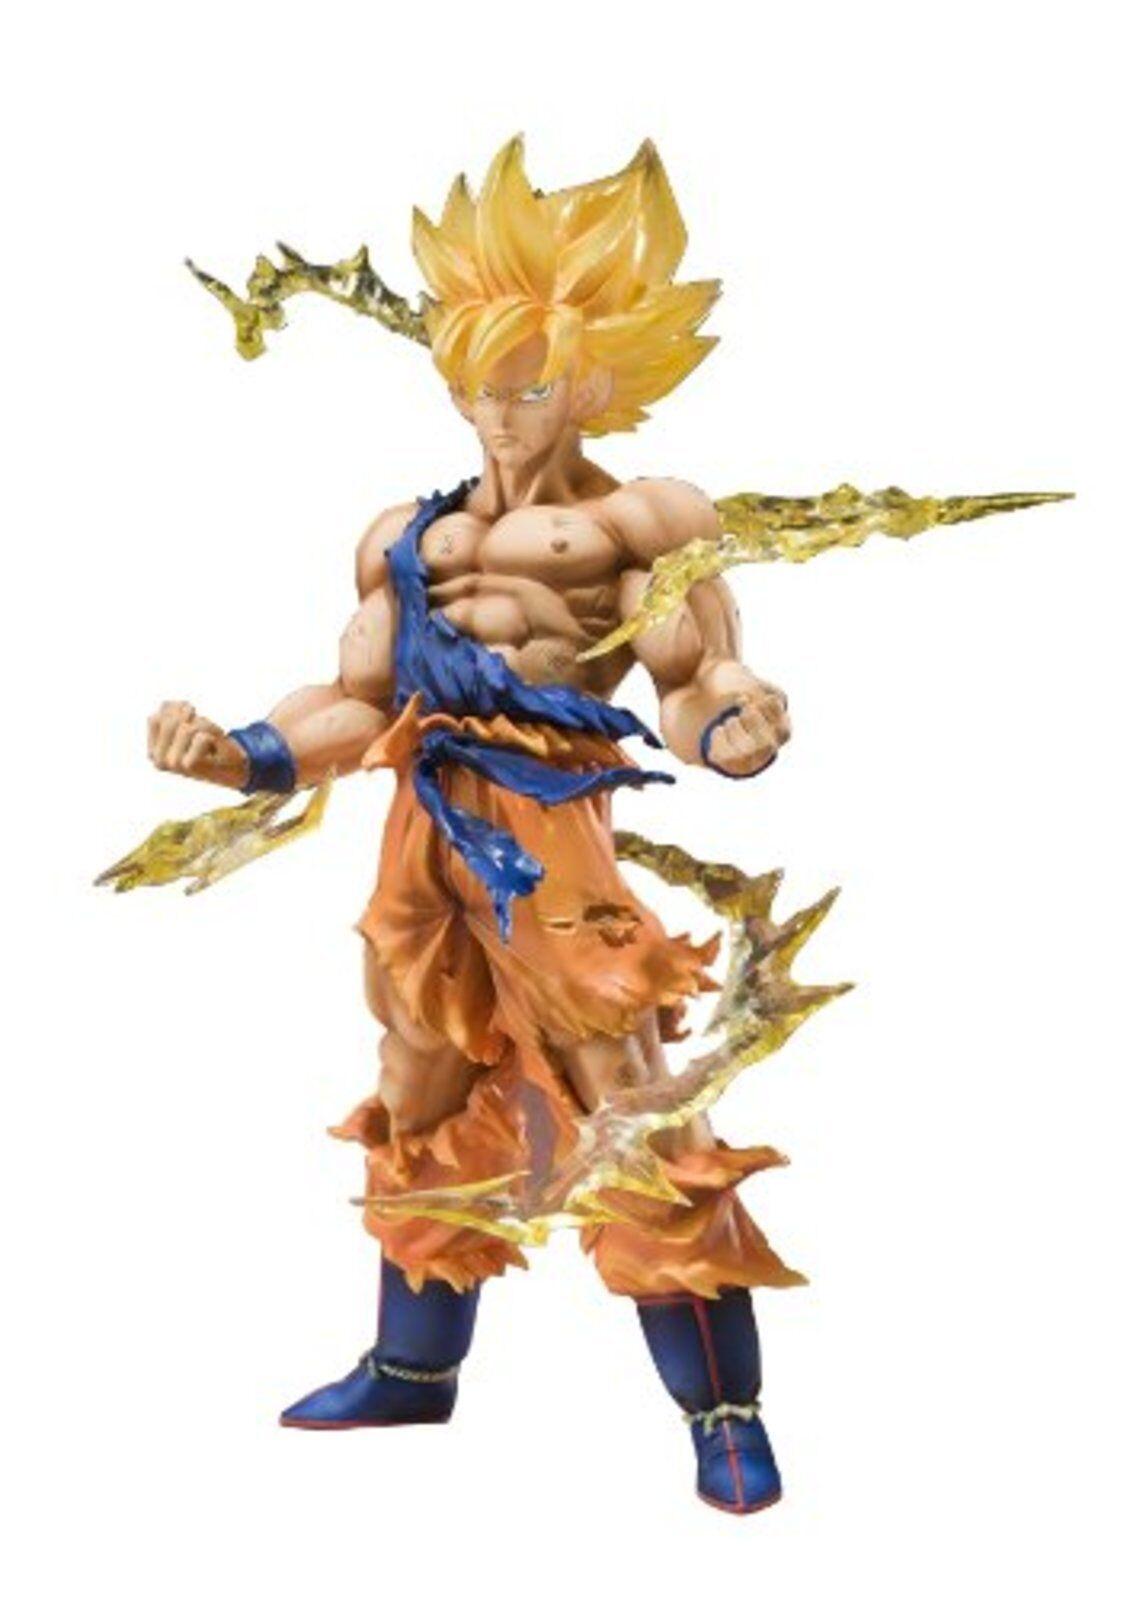 Figuarts Zero Dragon Ball Kai Super Saiyan Figlio Goku Statuetta F S W